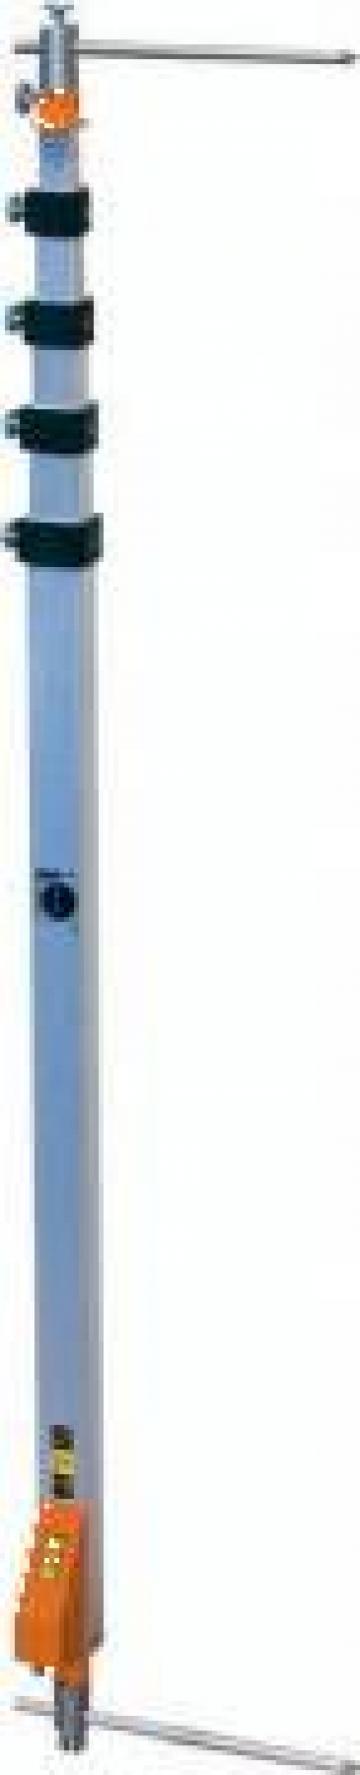 Aparat de masura telescopic Nedo Auto-Messfix de la Topo Laser Impex Srl